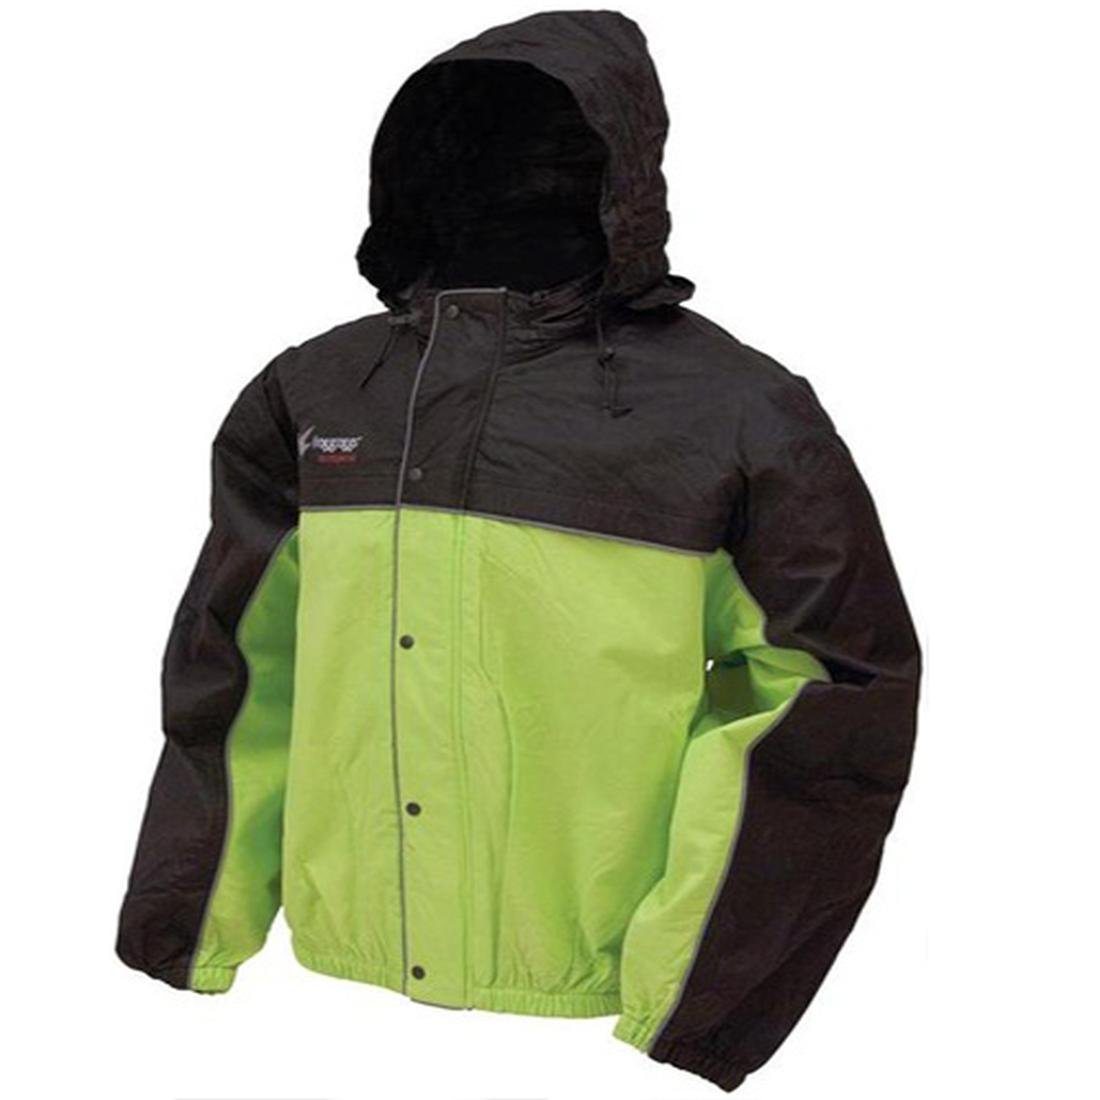 Frogg Toggs Road Toad Rain Jacket - X-Large/Black/Hi-Viz Green